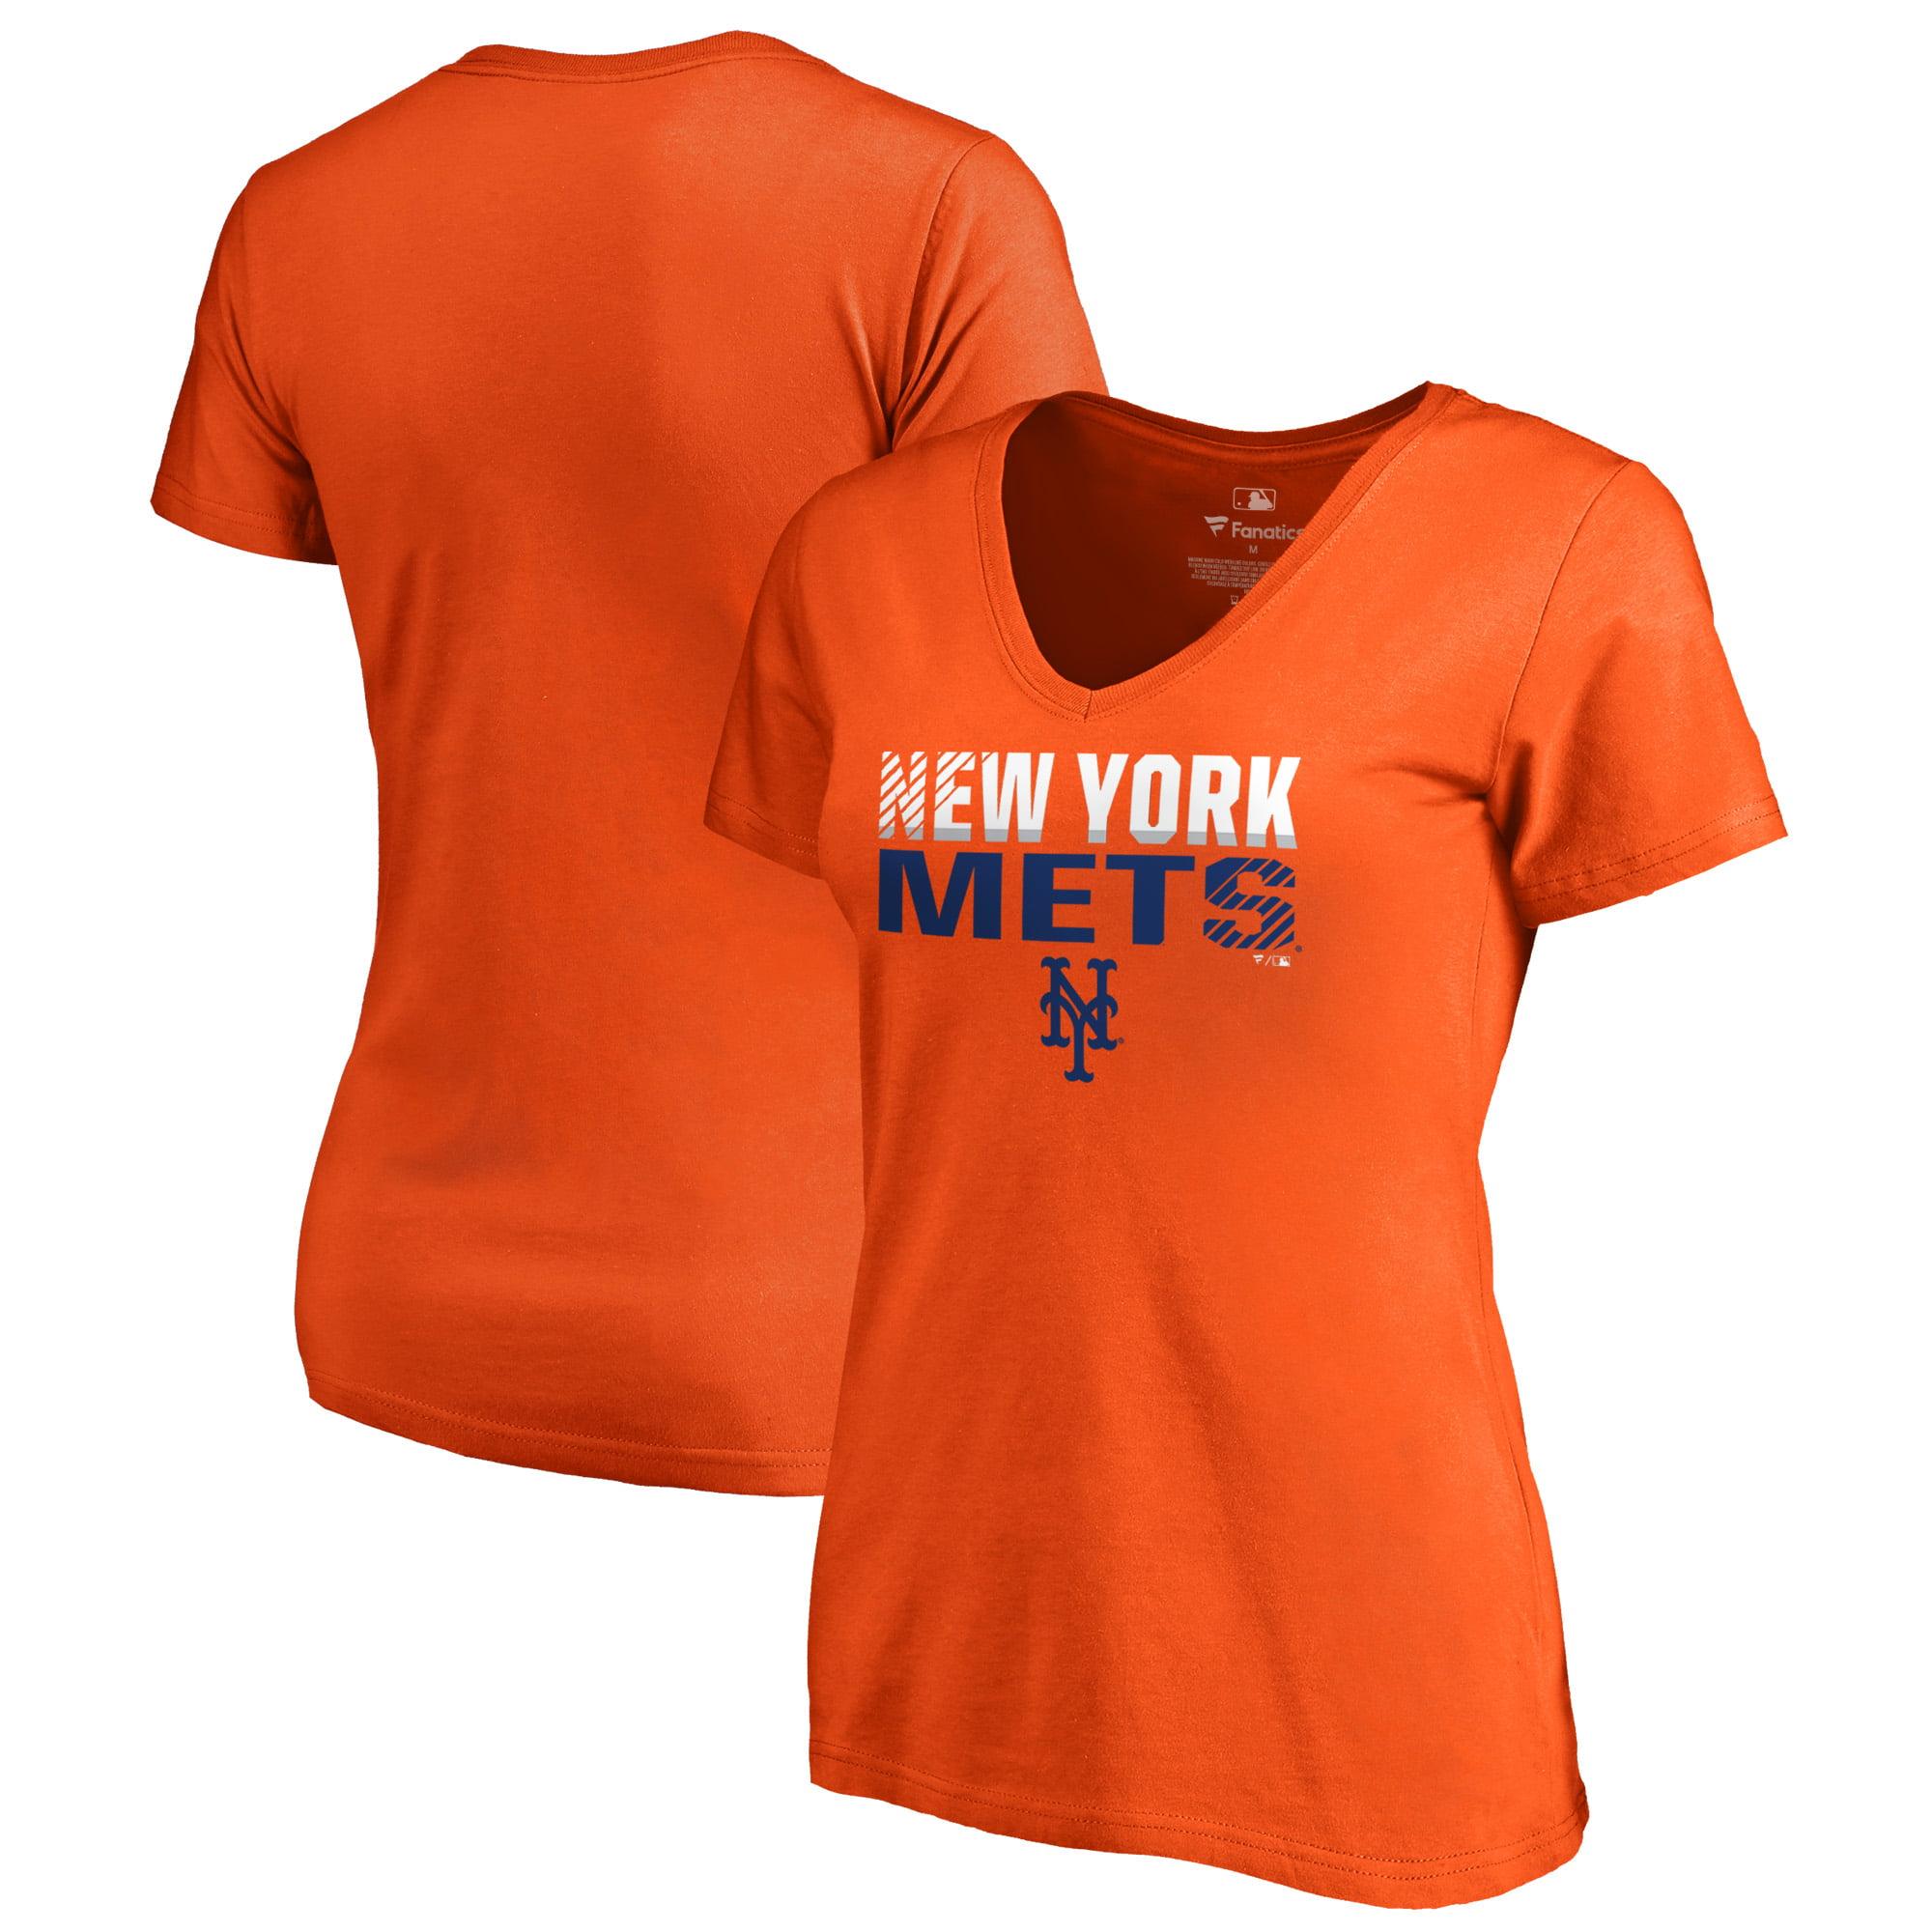 New York Mets Fanatics Branded Women's Fade Out Plus Size V-Neck T-Shirt - Orange